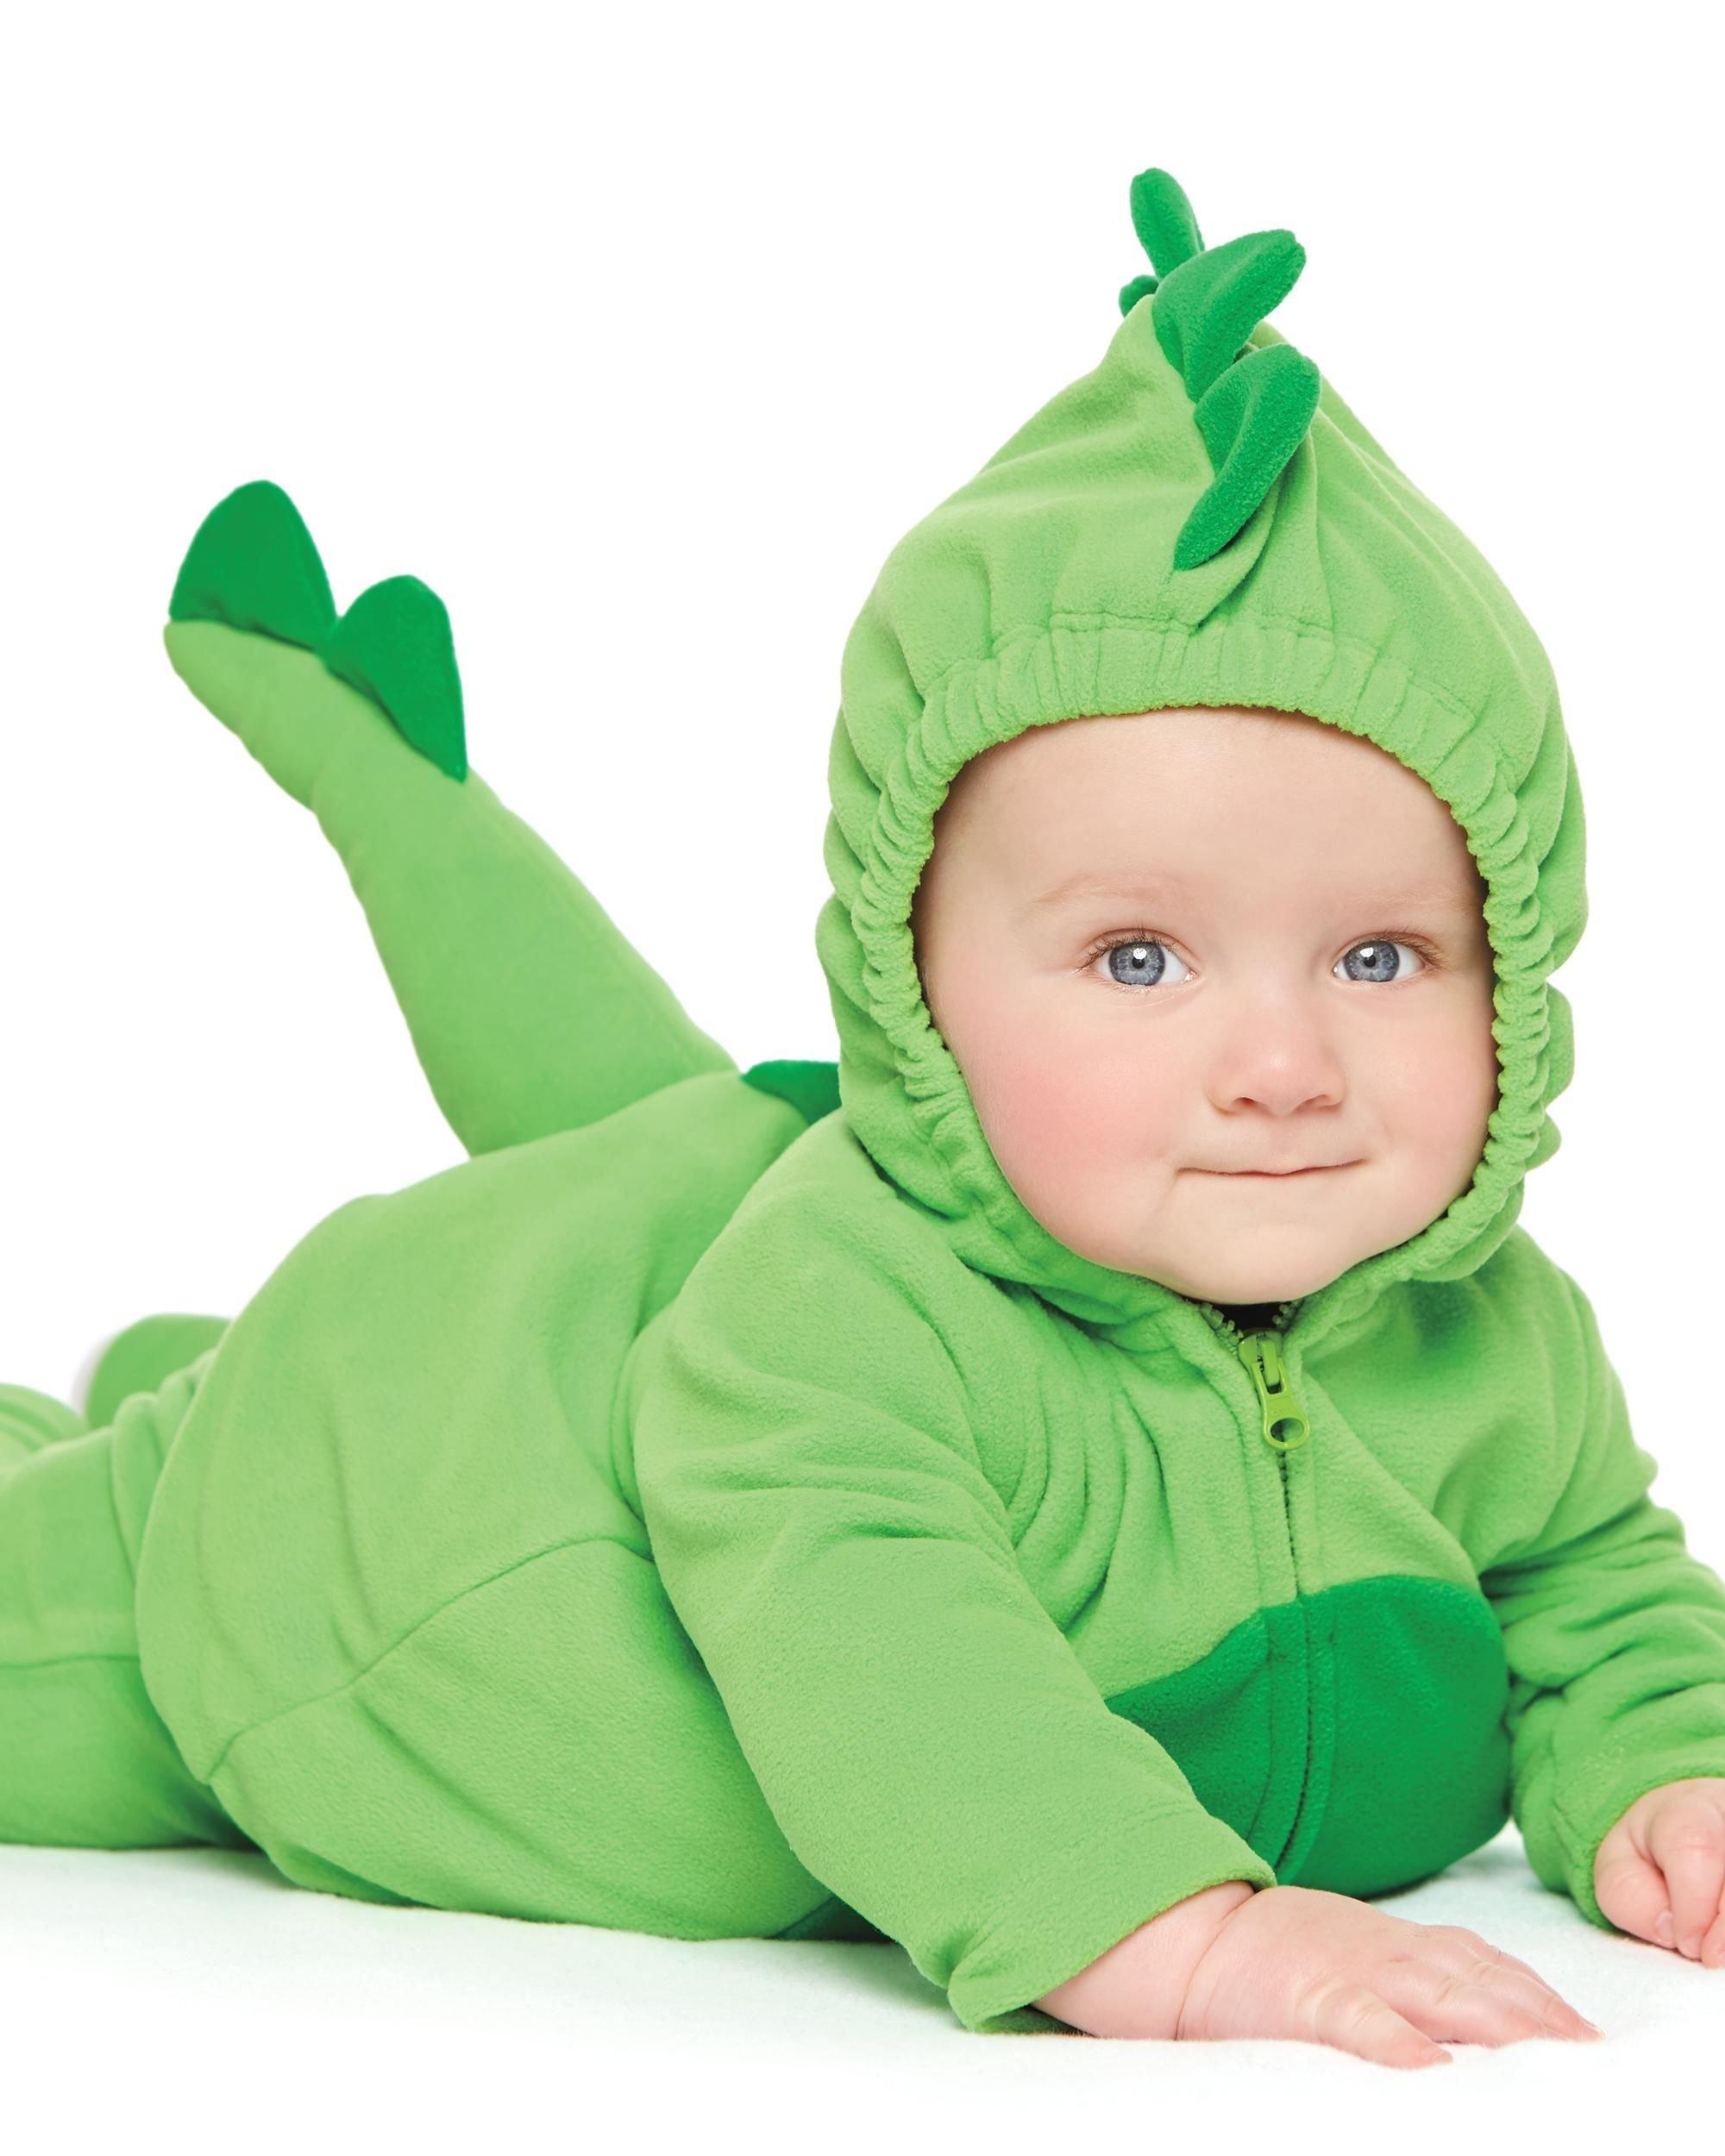 Carteru0027s Baby Boysu0027 Little Dinosaur Costume 6 Months  sc 1 st  Amazon.com & Best Rated in Babiesu0027 Costumes u0026 Helpful Customer Reviews - Amazon.com